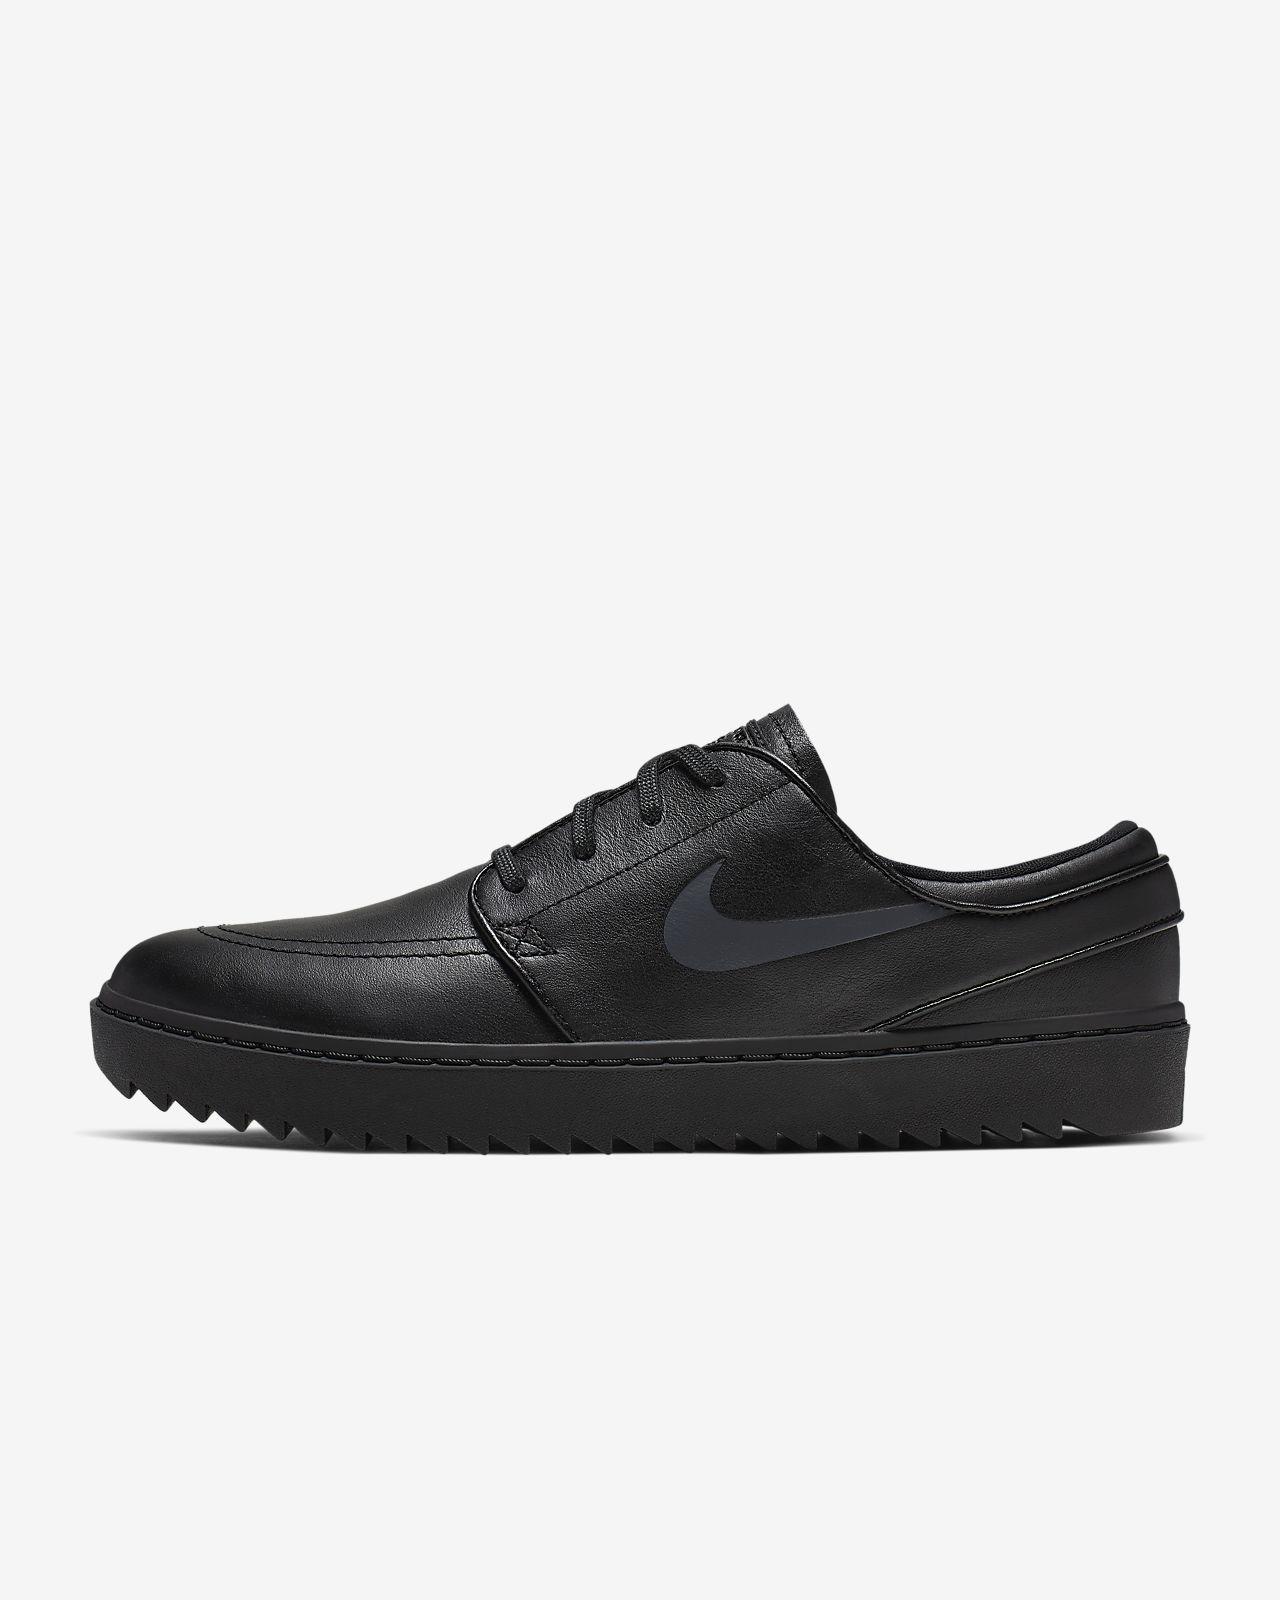 Nike Janoski G Men's Golf Shoe